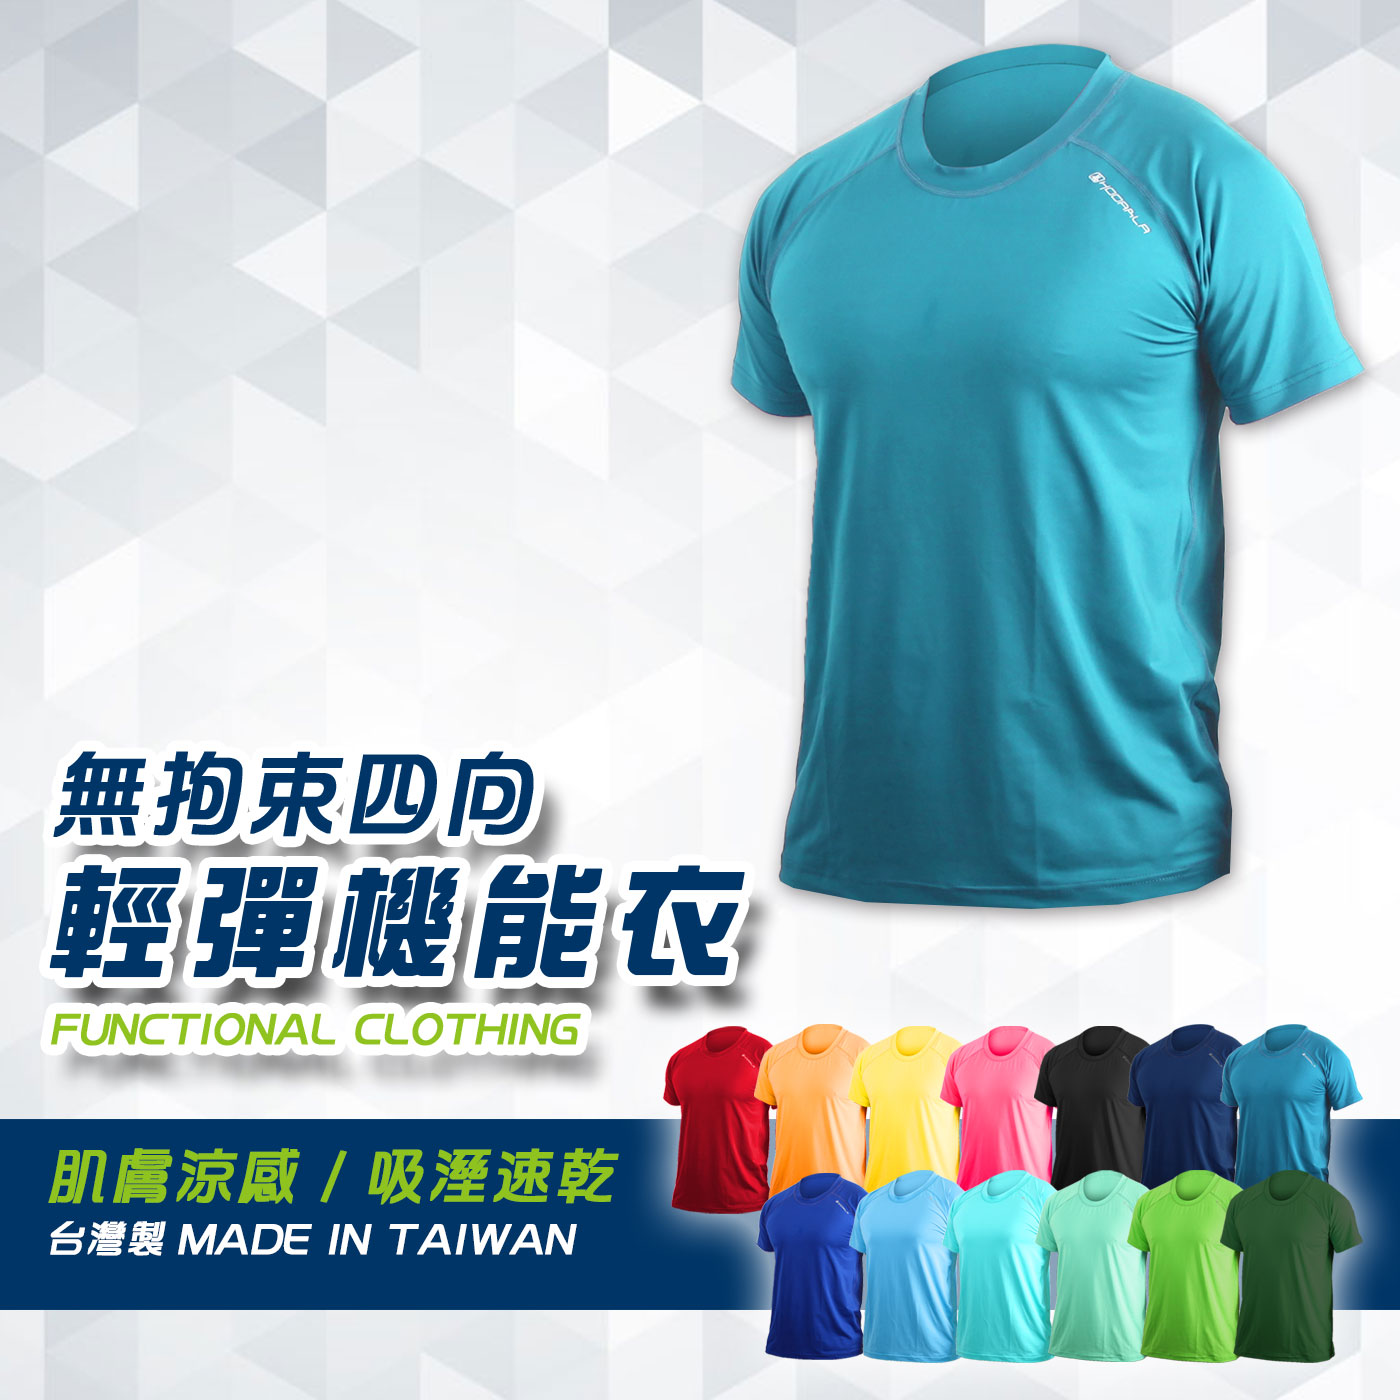 HODARLA 男女無拘束短袖T恤-輕彈 抗UV 圓領 台灣製 涼感 路跑 藍綠@3114805@